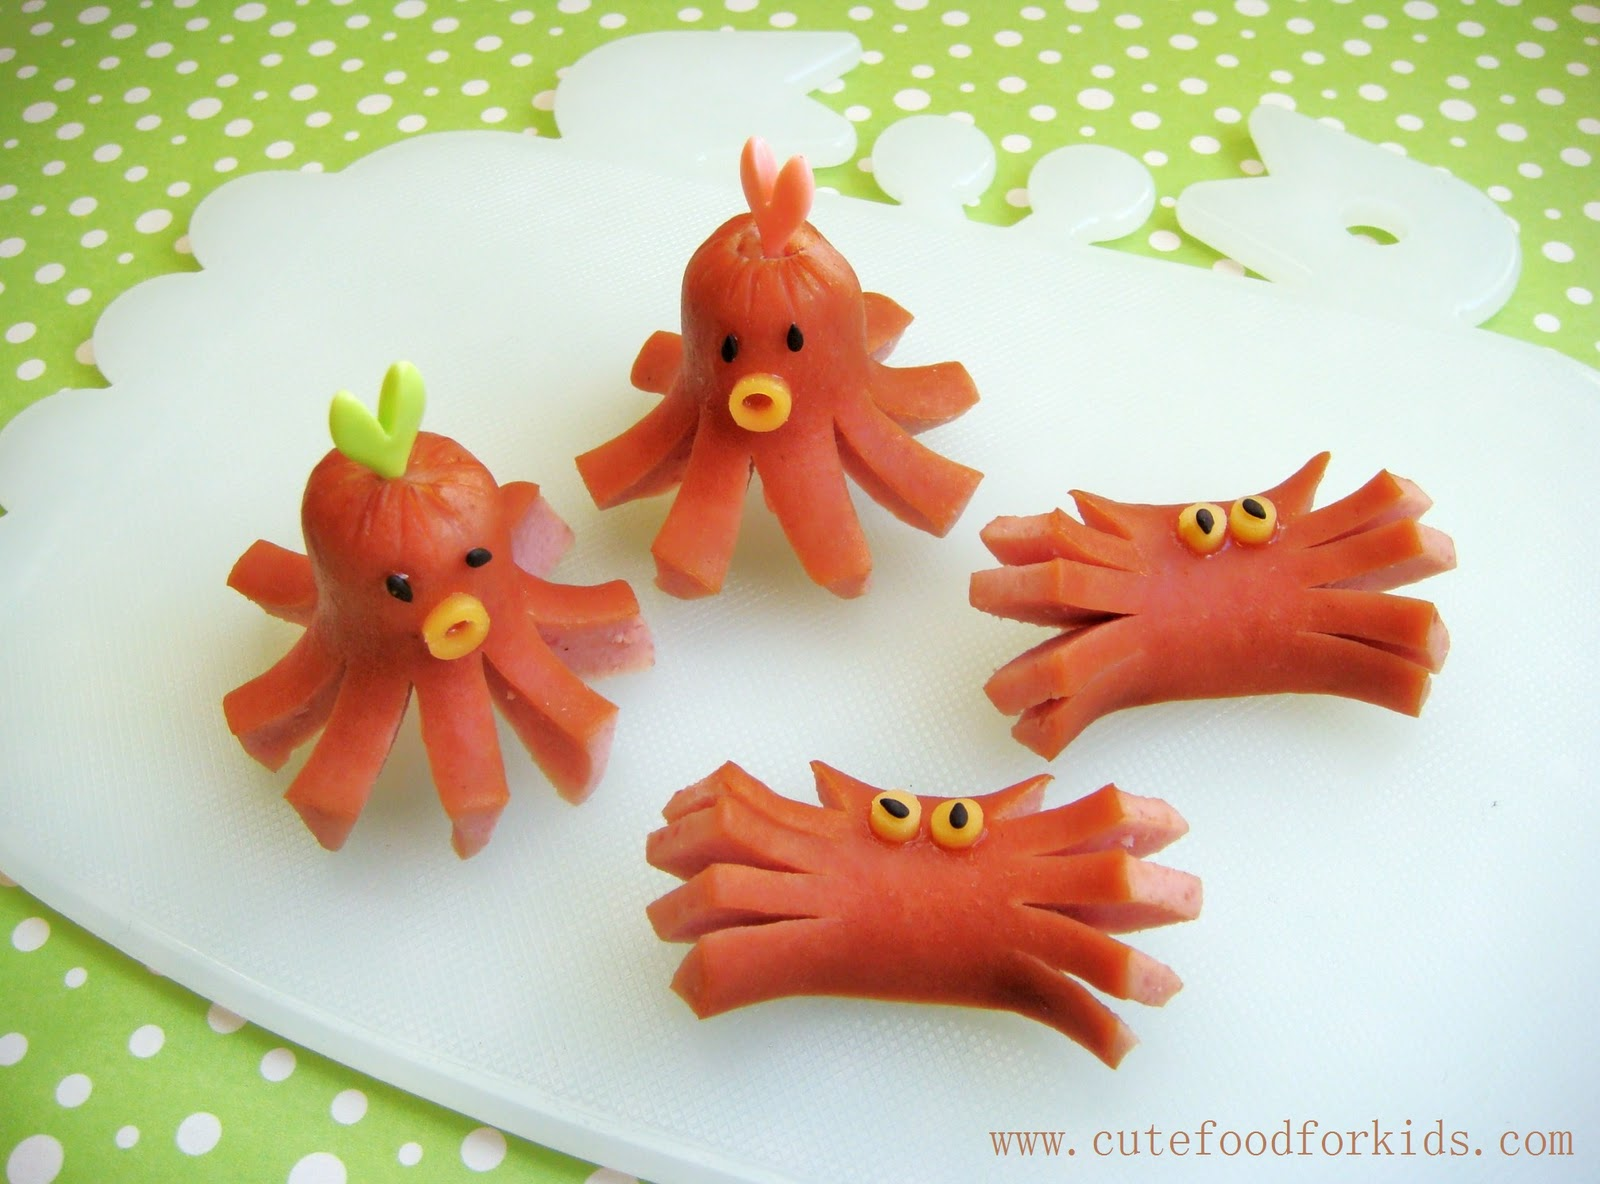 Sea Creature Hot Dogs